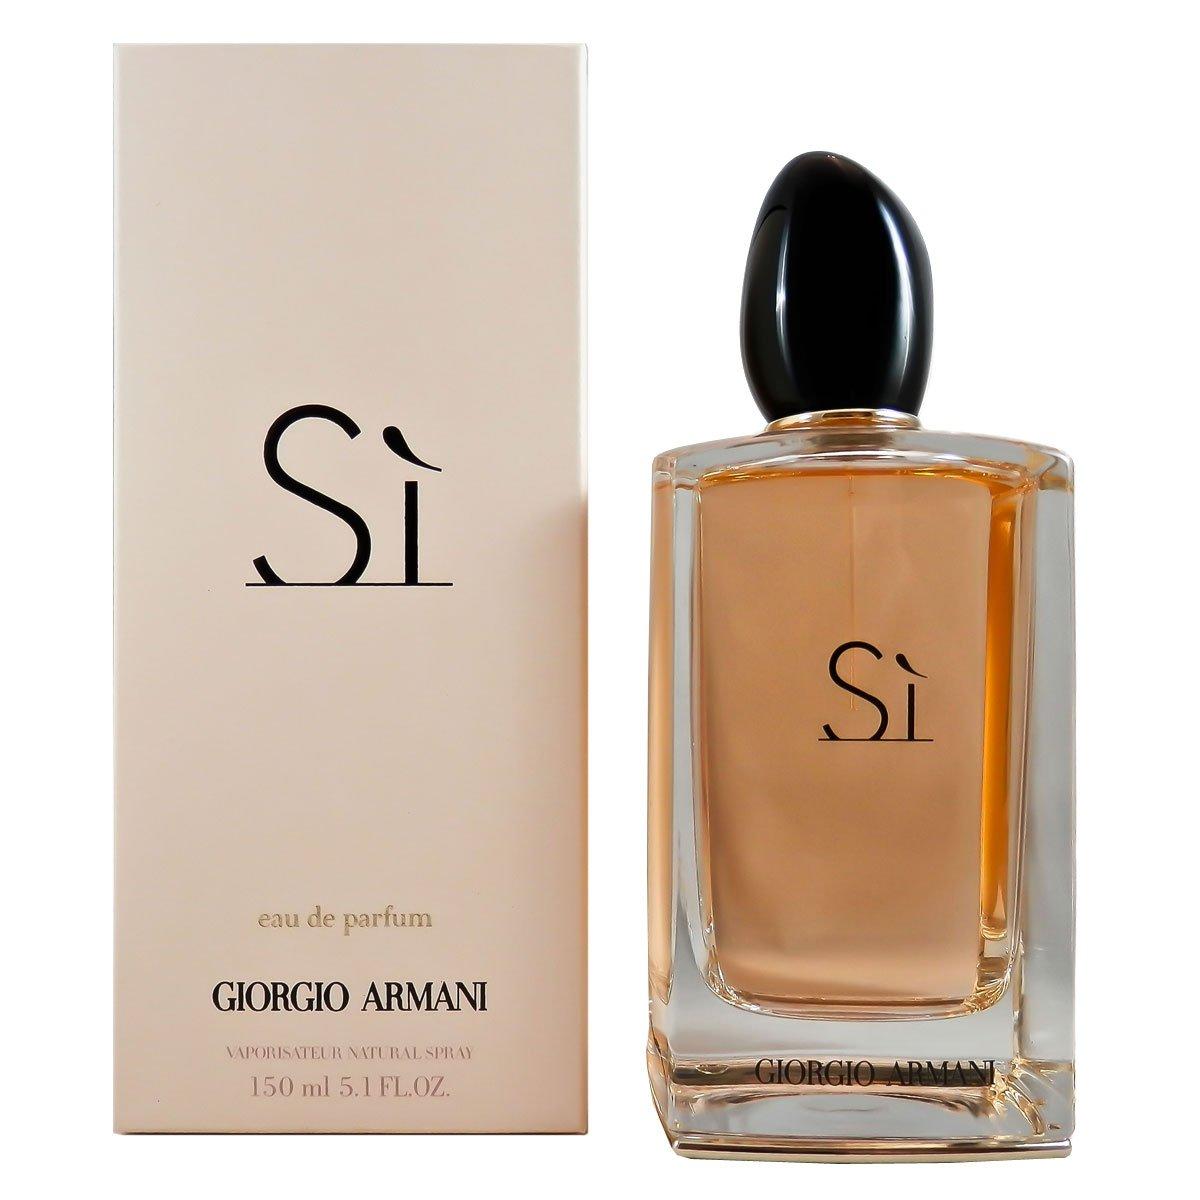 f41772b6 Amazon.com : Giorgio Armani Si Eau De Parfum Spray for Women, 5.1 Ounce :  Beauty